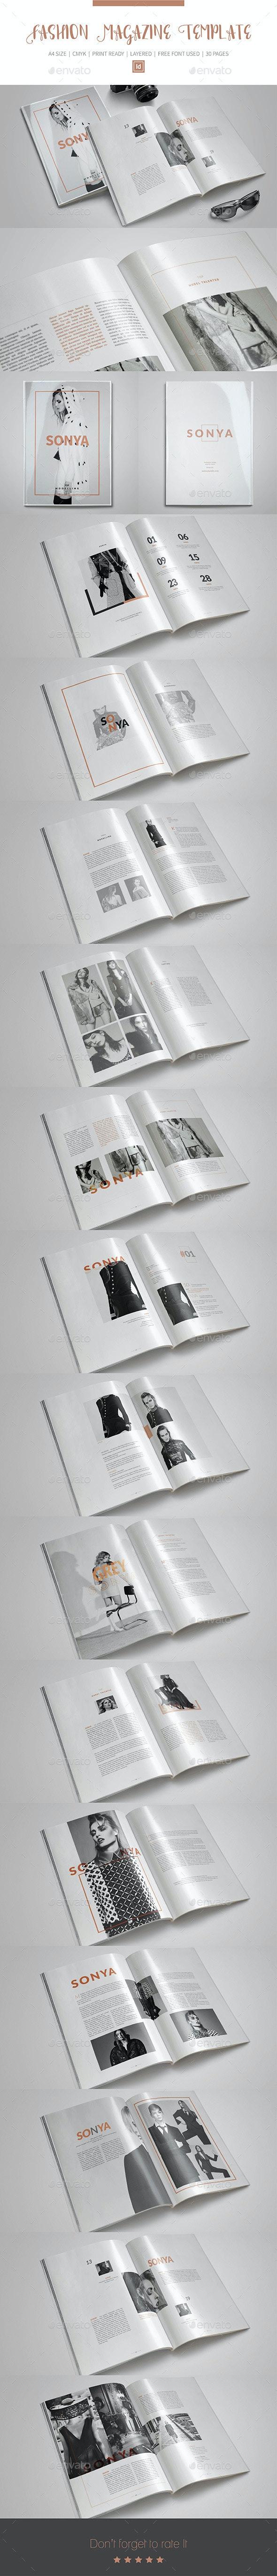 Fashion InDesign Magazine Template - Magazines Print Templates